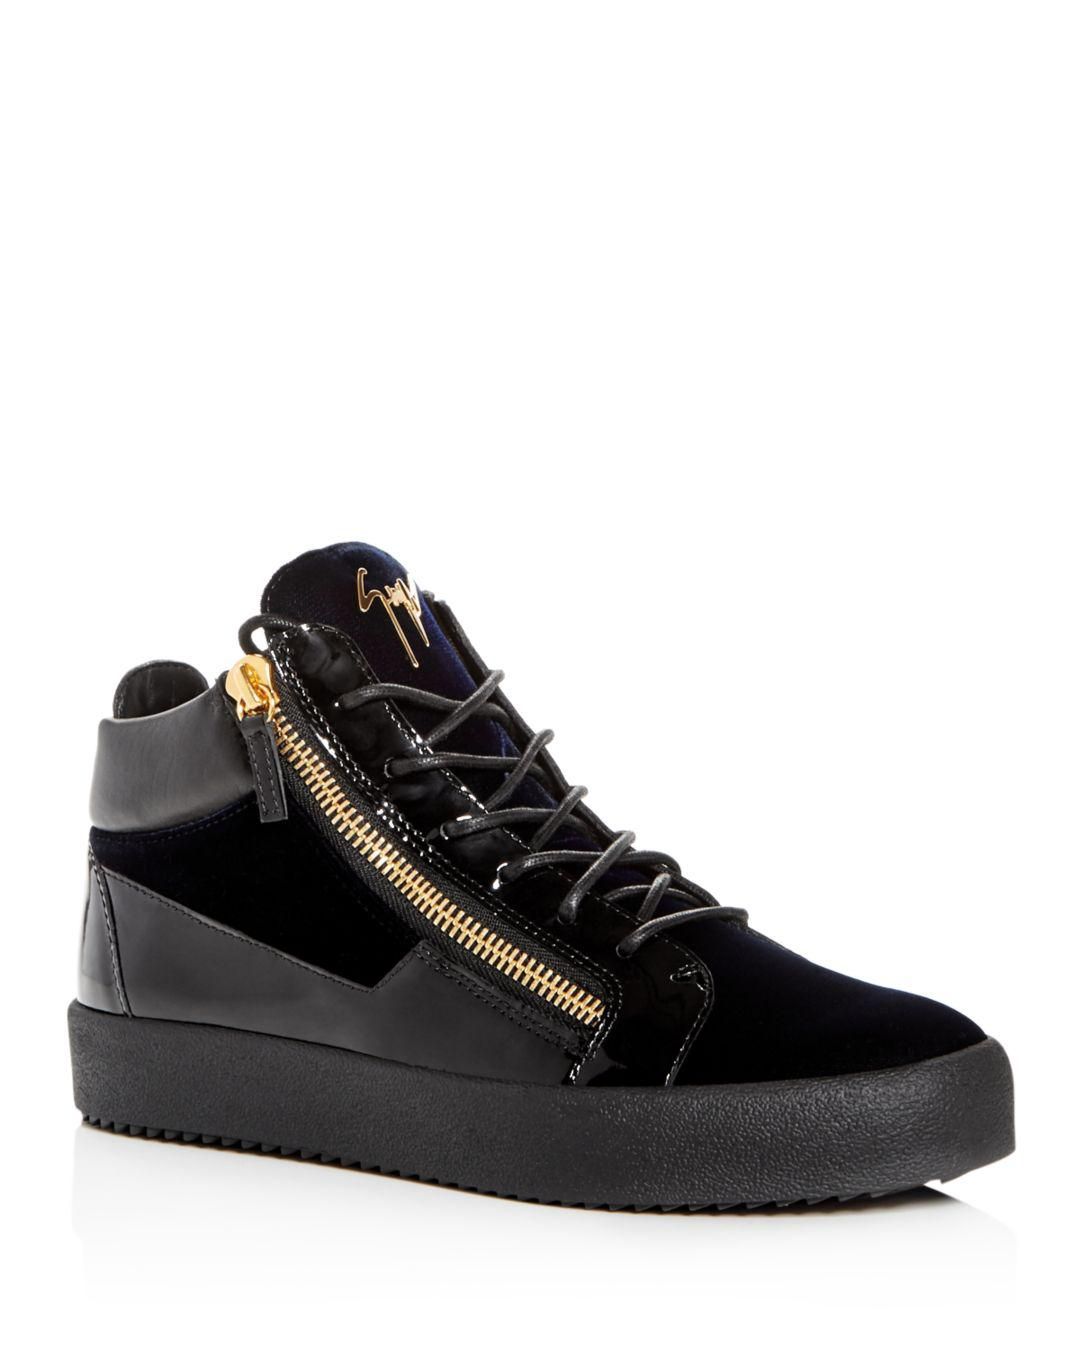 9a0b0bf44f383 Giuseppe Zanotti Men's Velvet & Patent Leather Mid Top Sneakers in ...